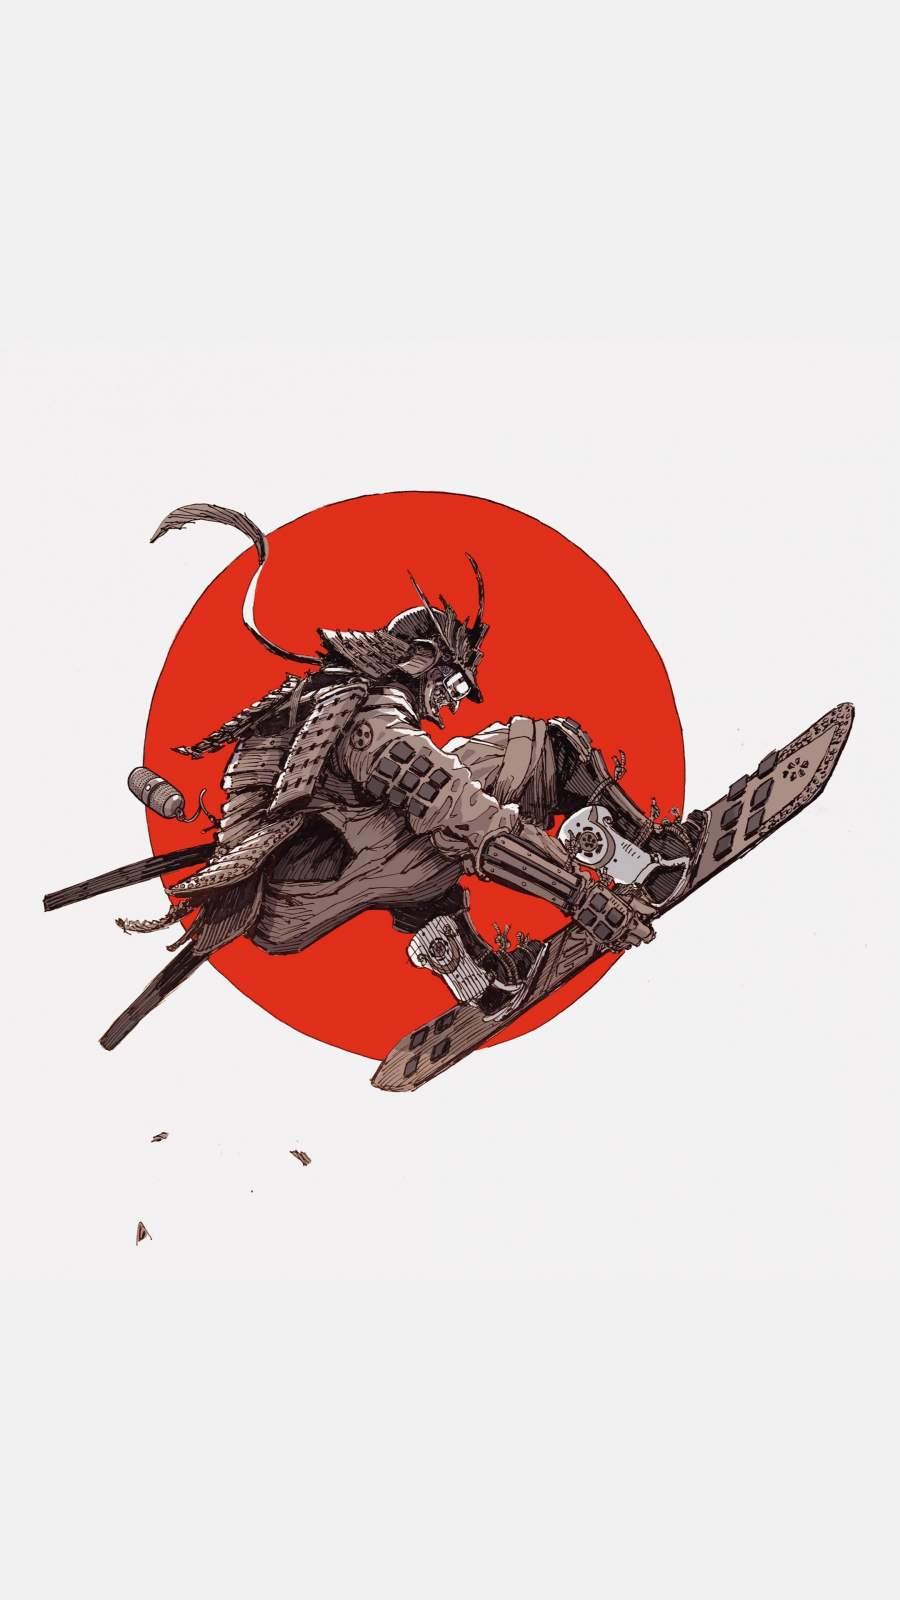 Snow Serfer Ninja